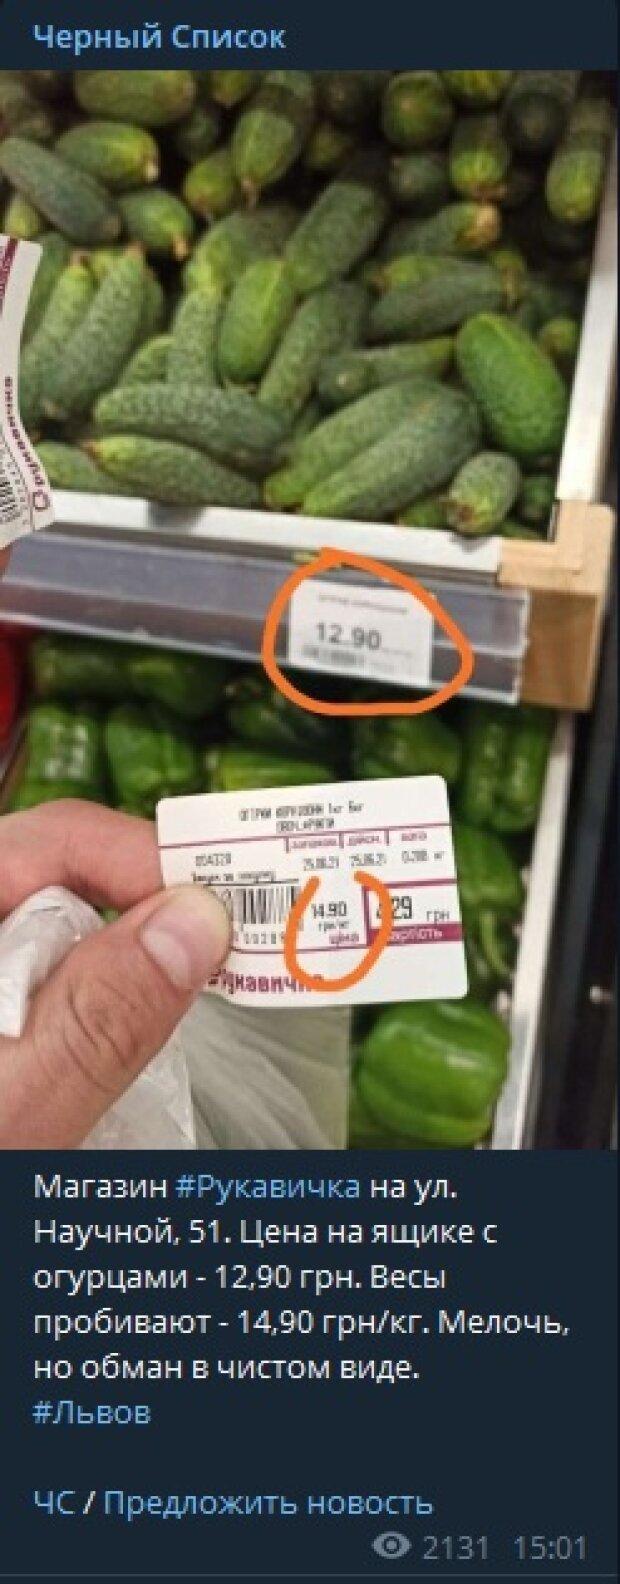 Обман в супермаркеті, скріншот: Telegram